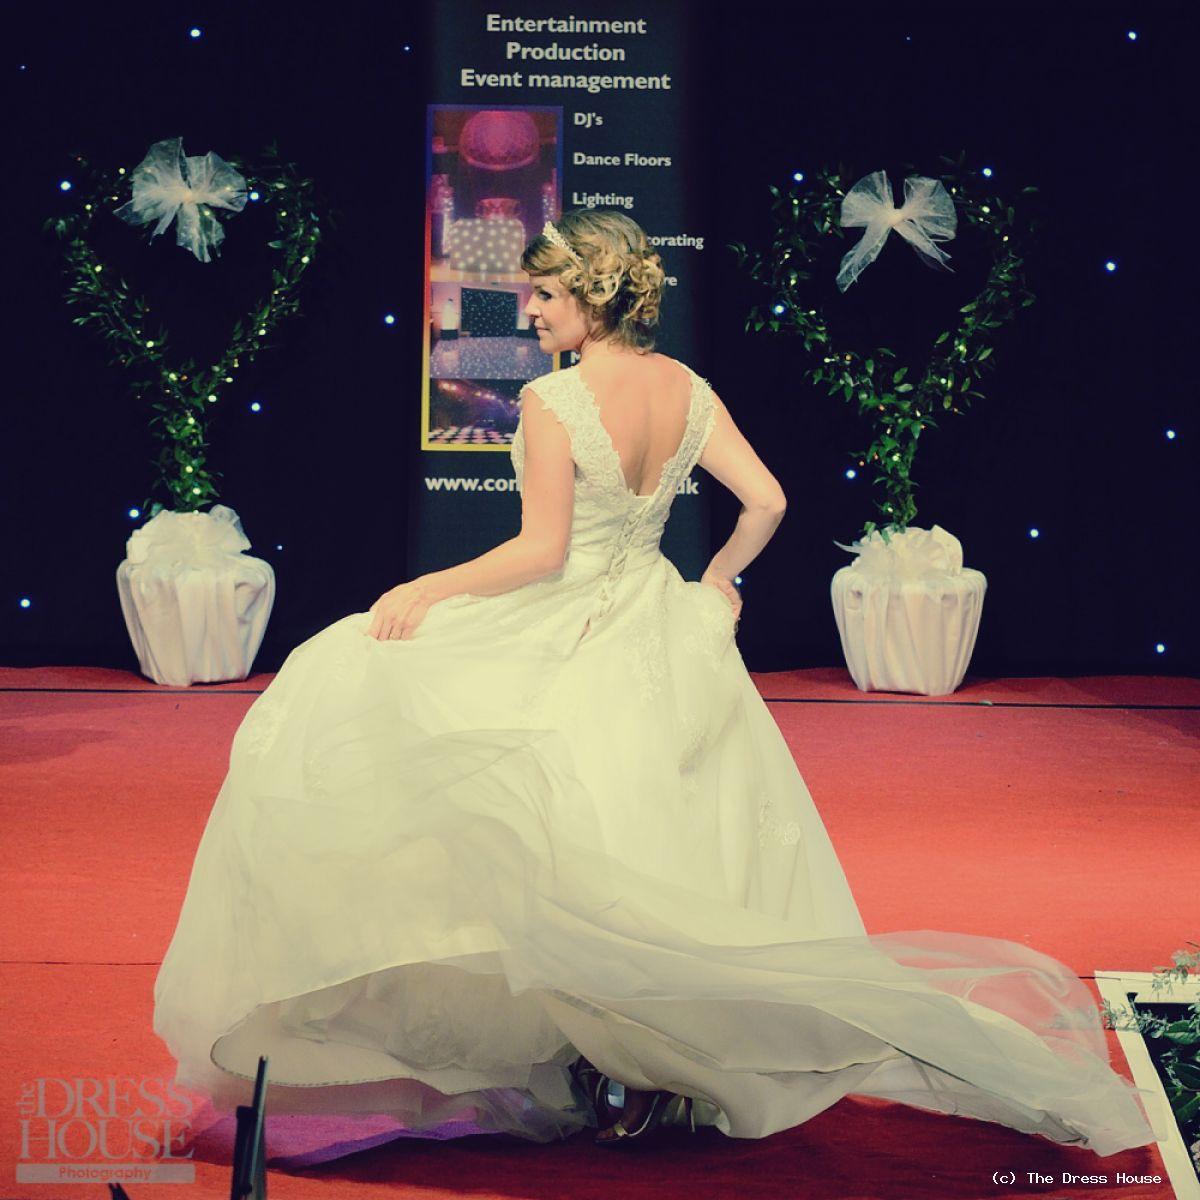 Catwalk Bridalwear Photos From St Albans Show